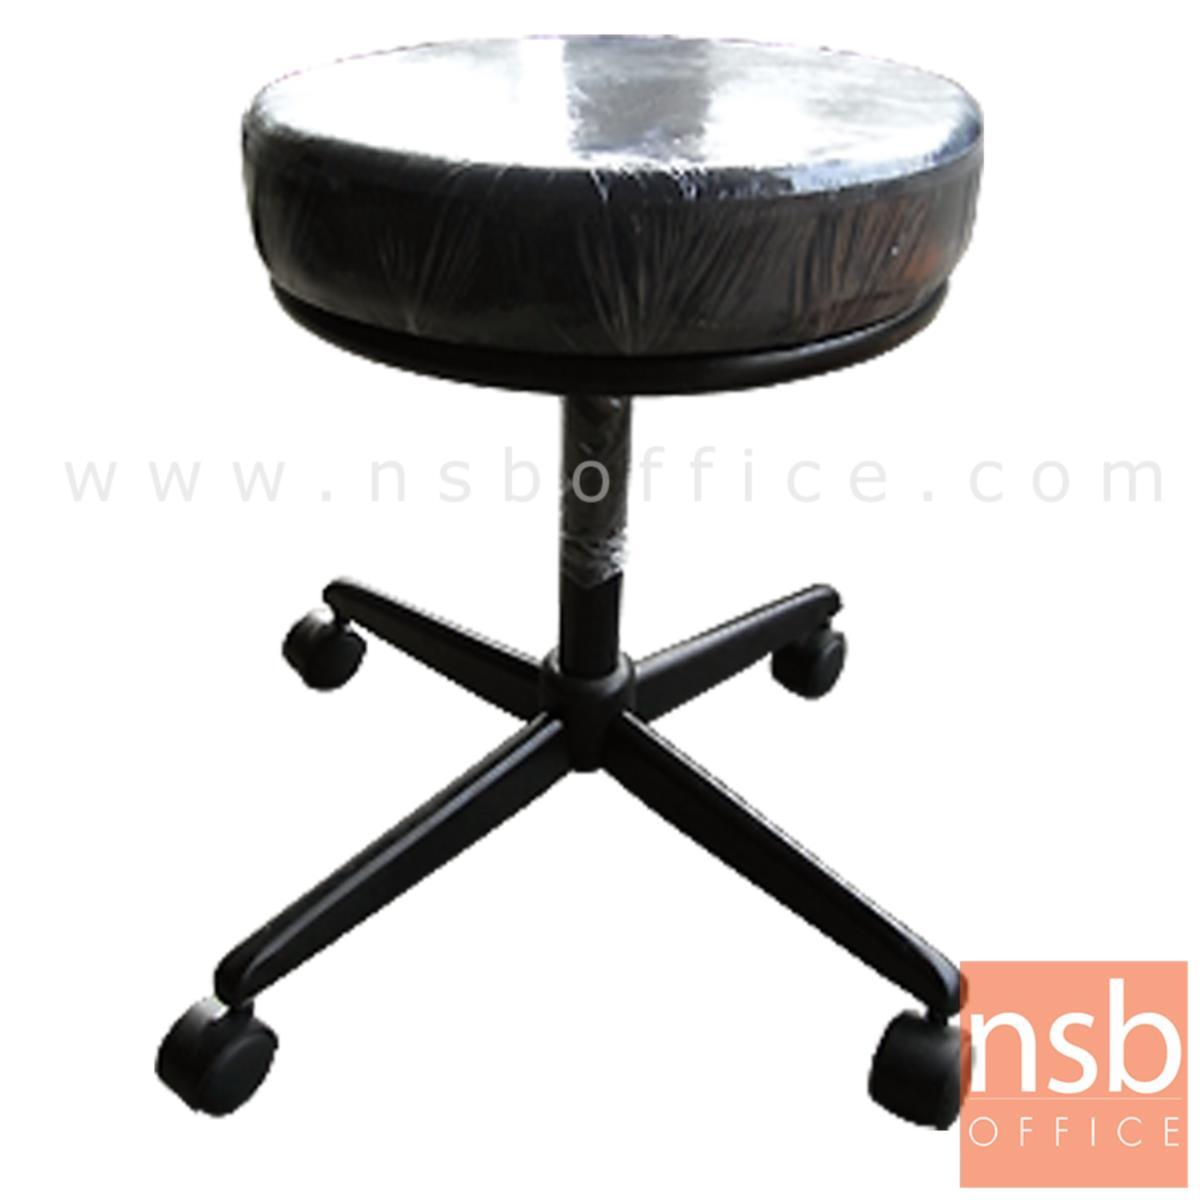 B09A063:เก้าอี้บาร์สตูลกลมเบาะใหญ่ รุ่น Midori (มิโดริ)  ขาเหล็ก